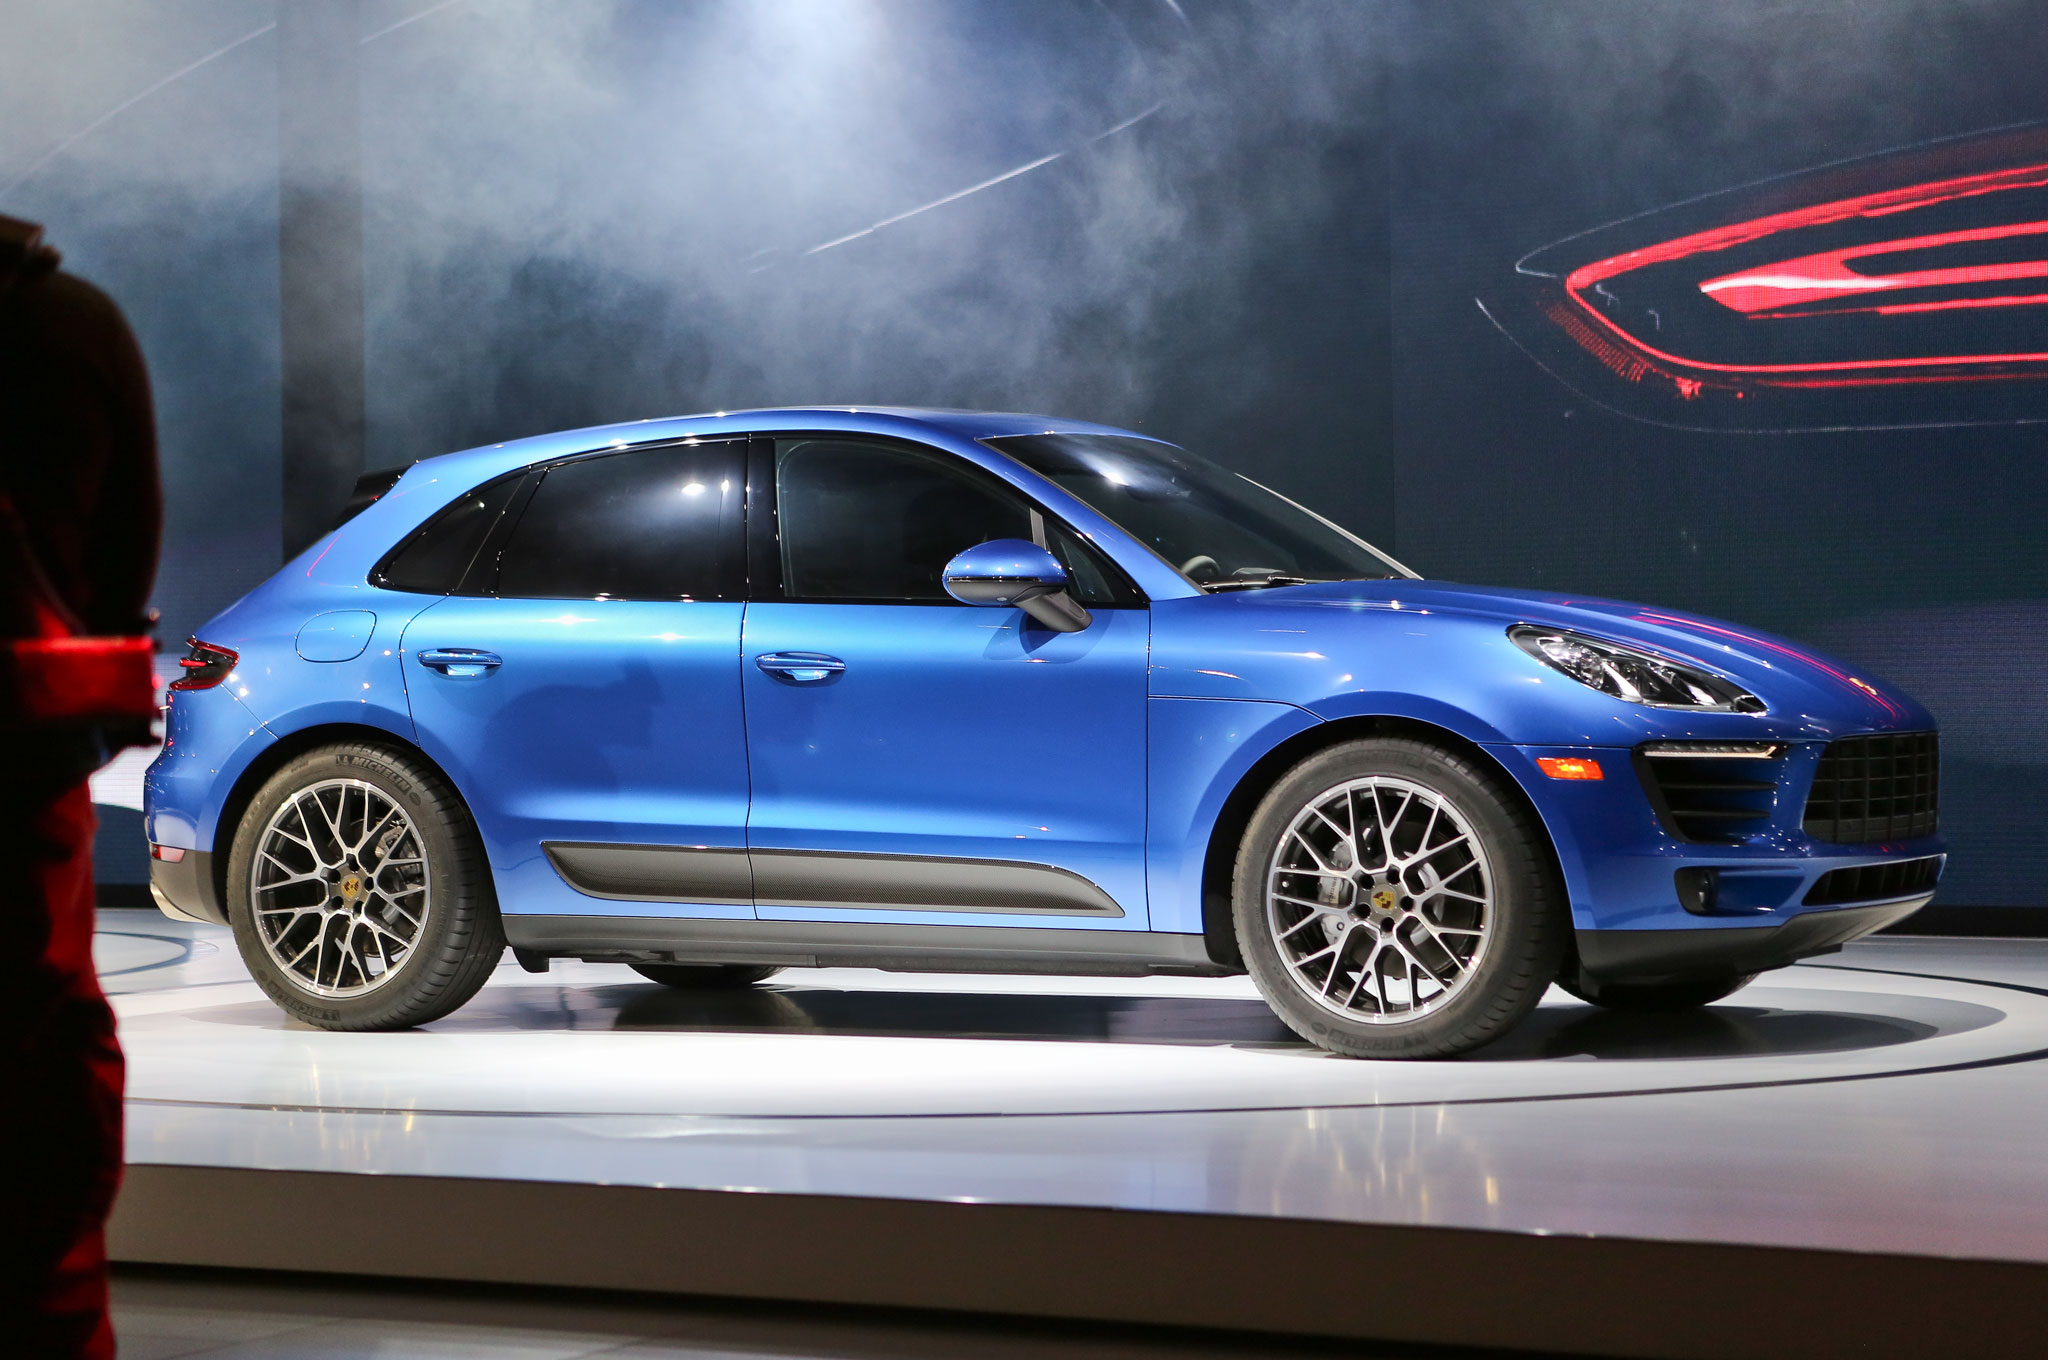 2015 Porsche Macan Side View Auto Show